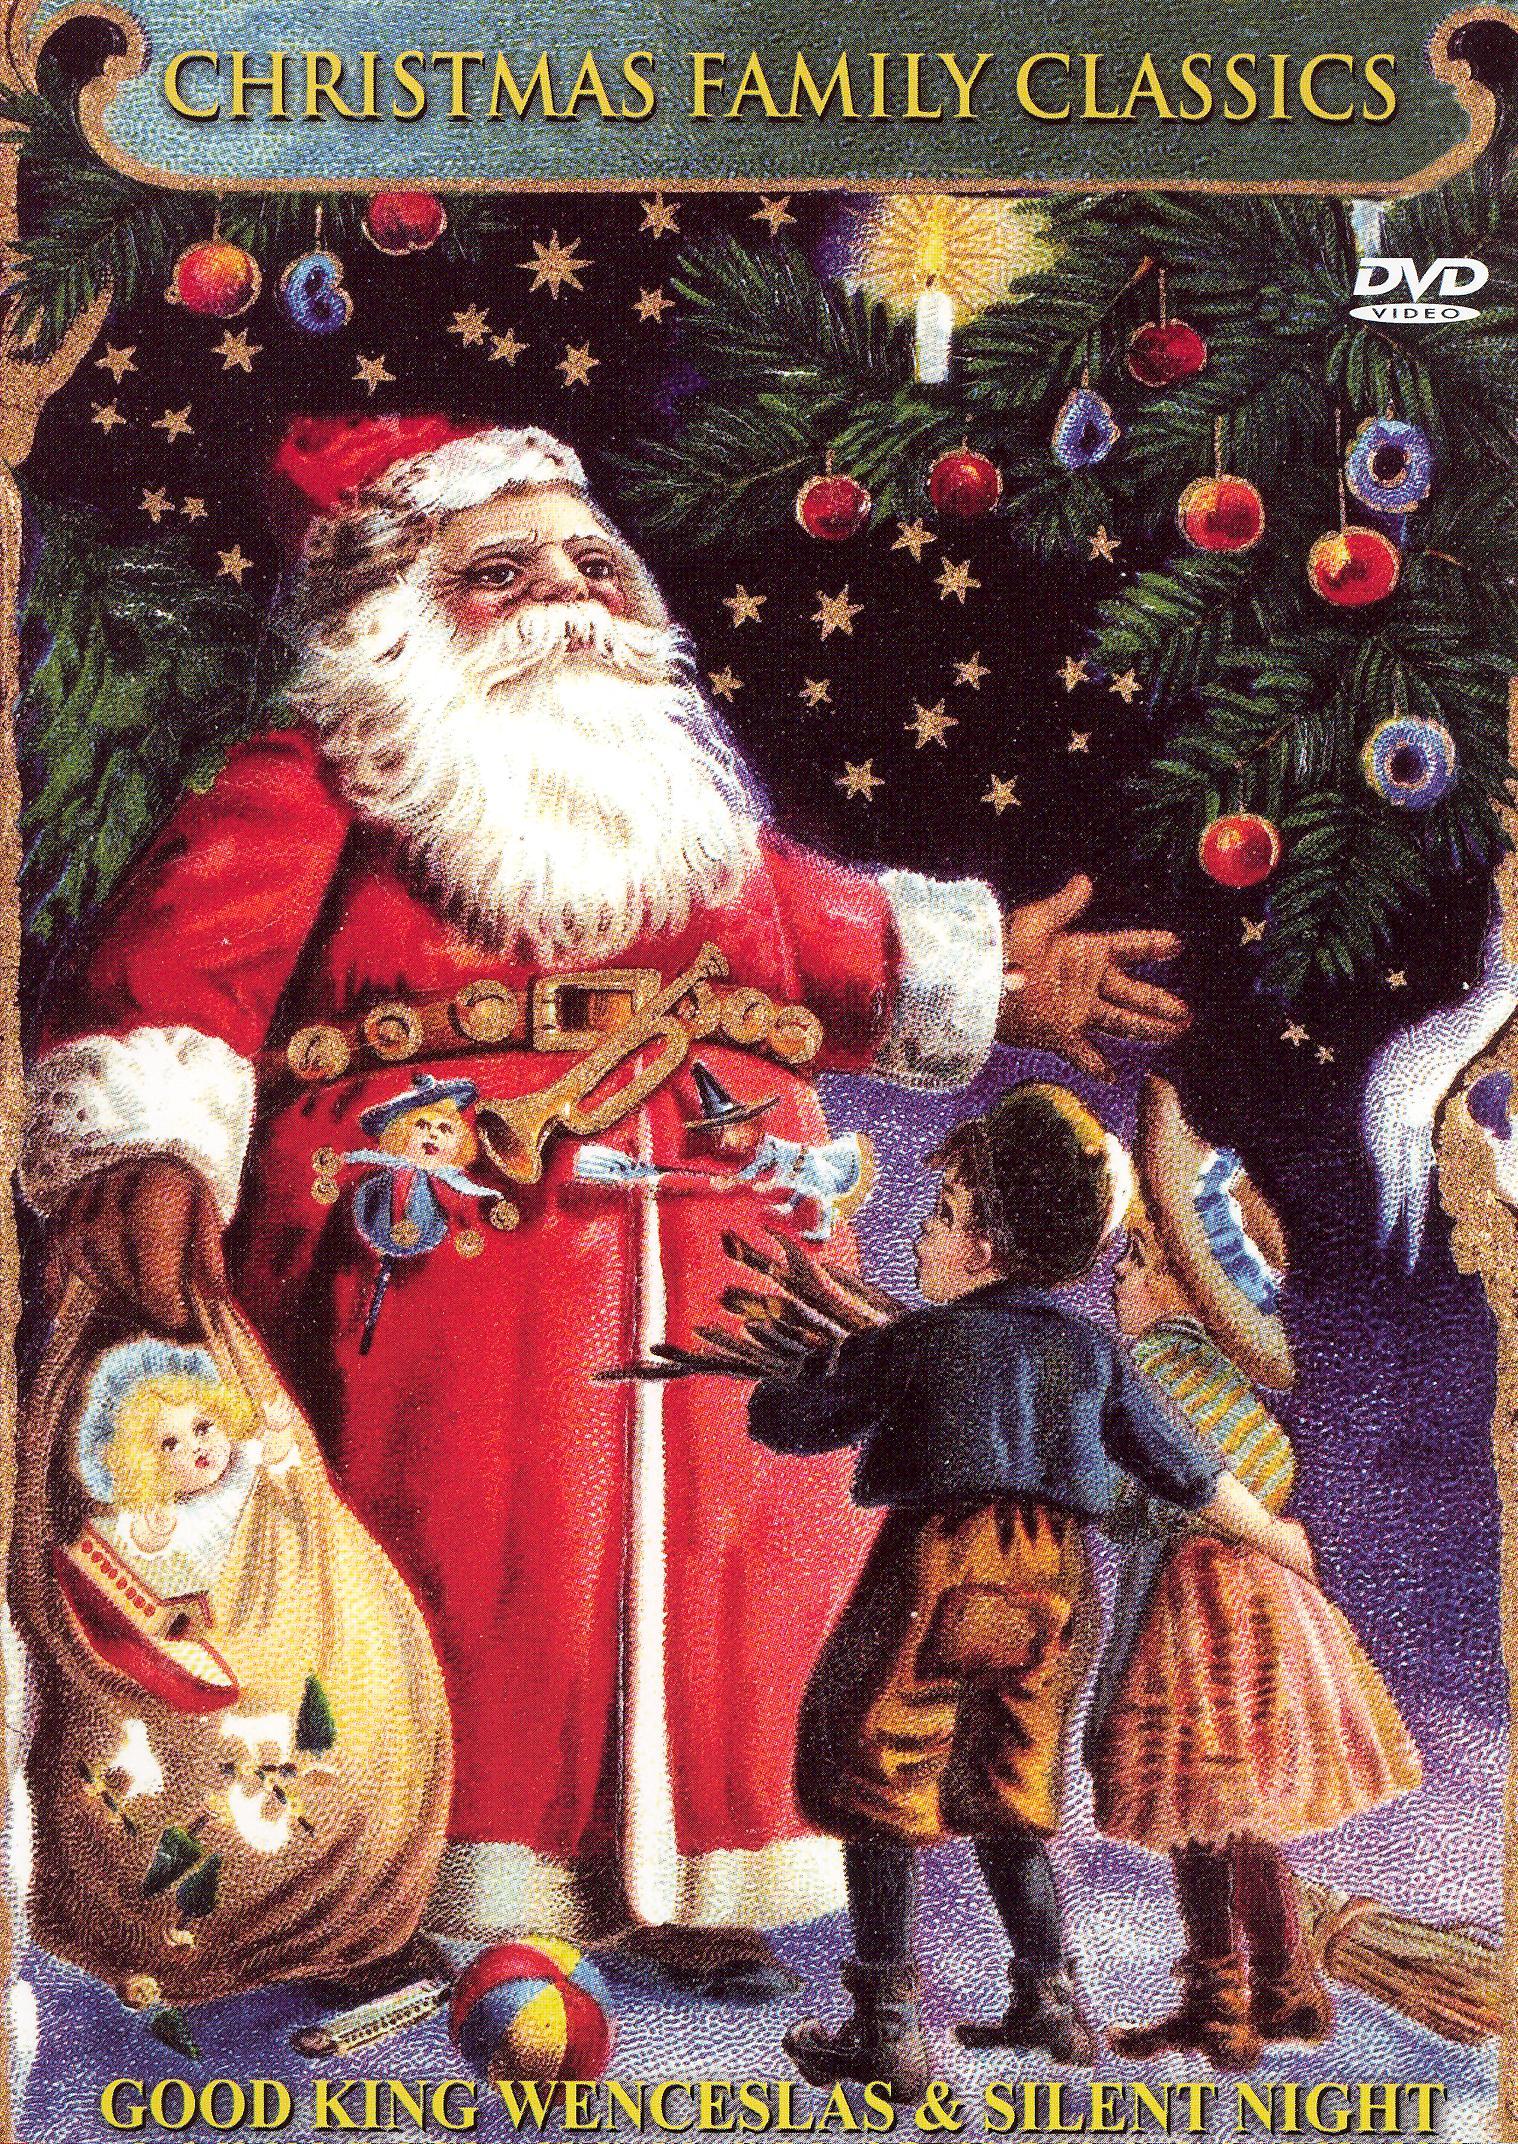 Children's Family Classics: Good King Wenceslas & Silent Night